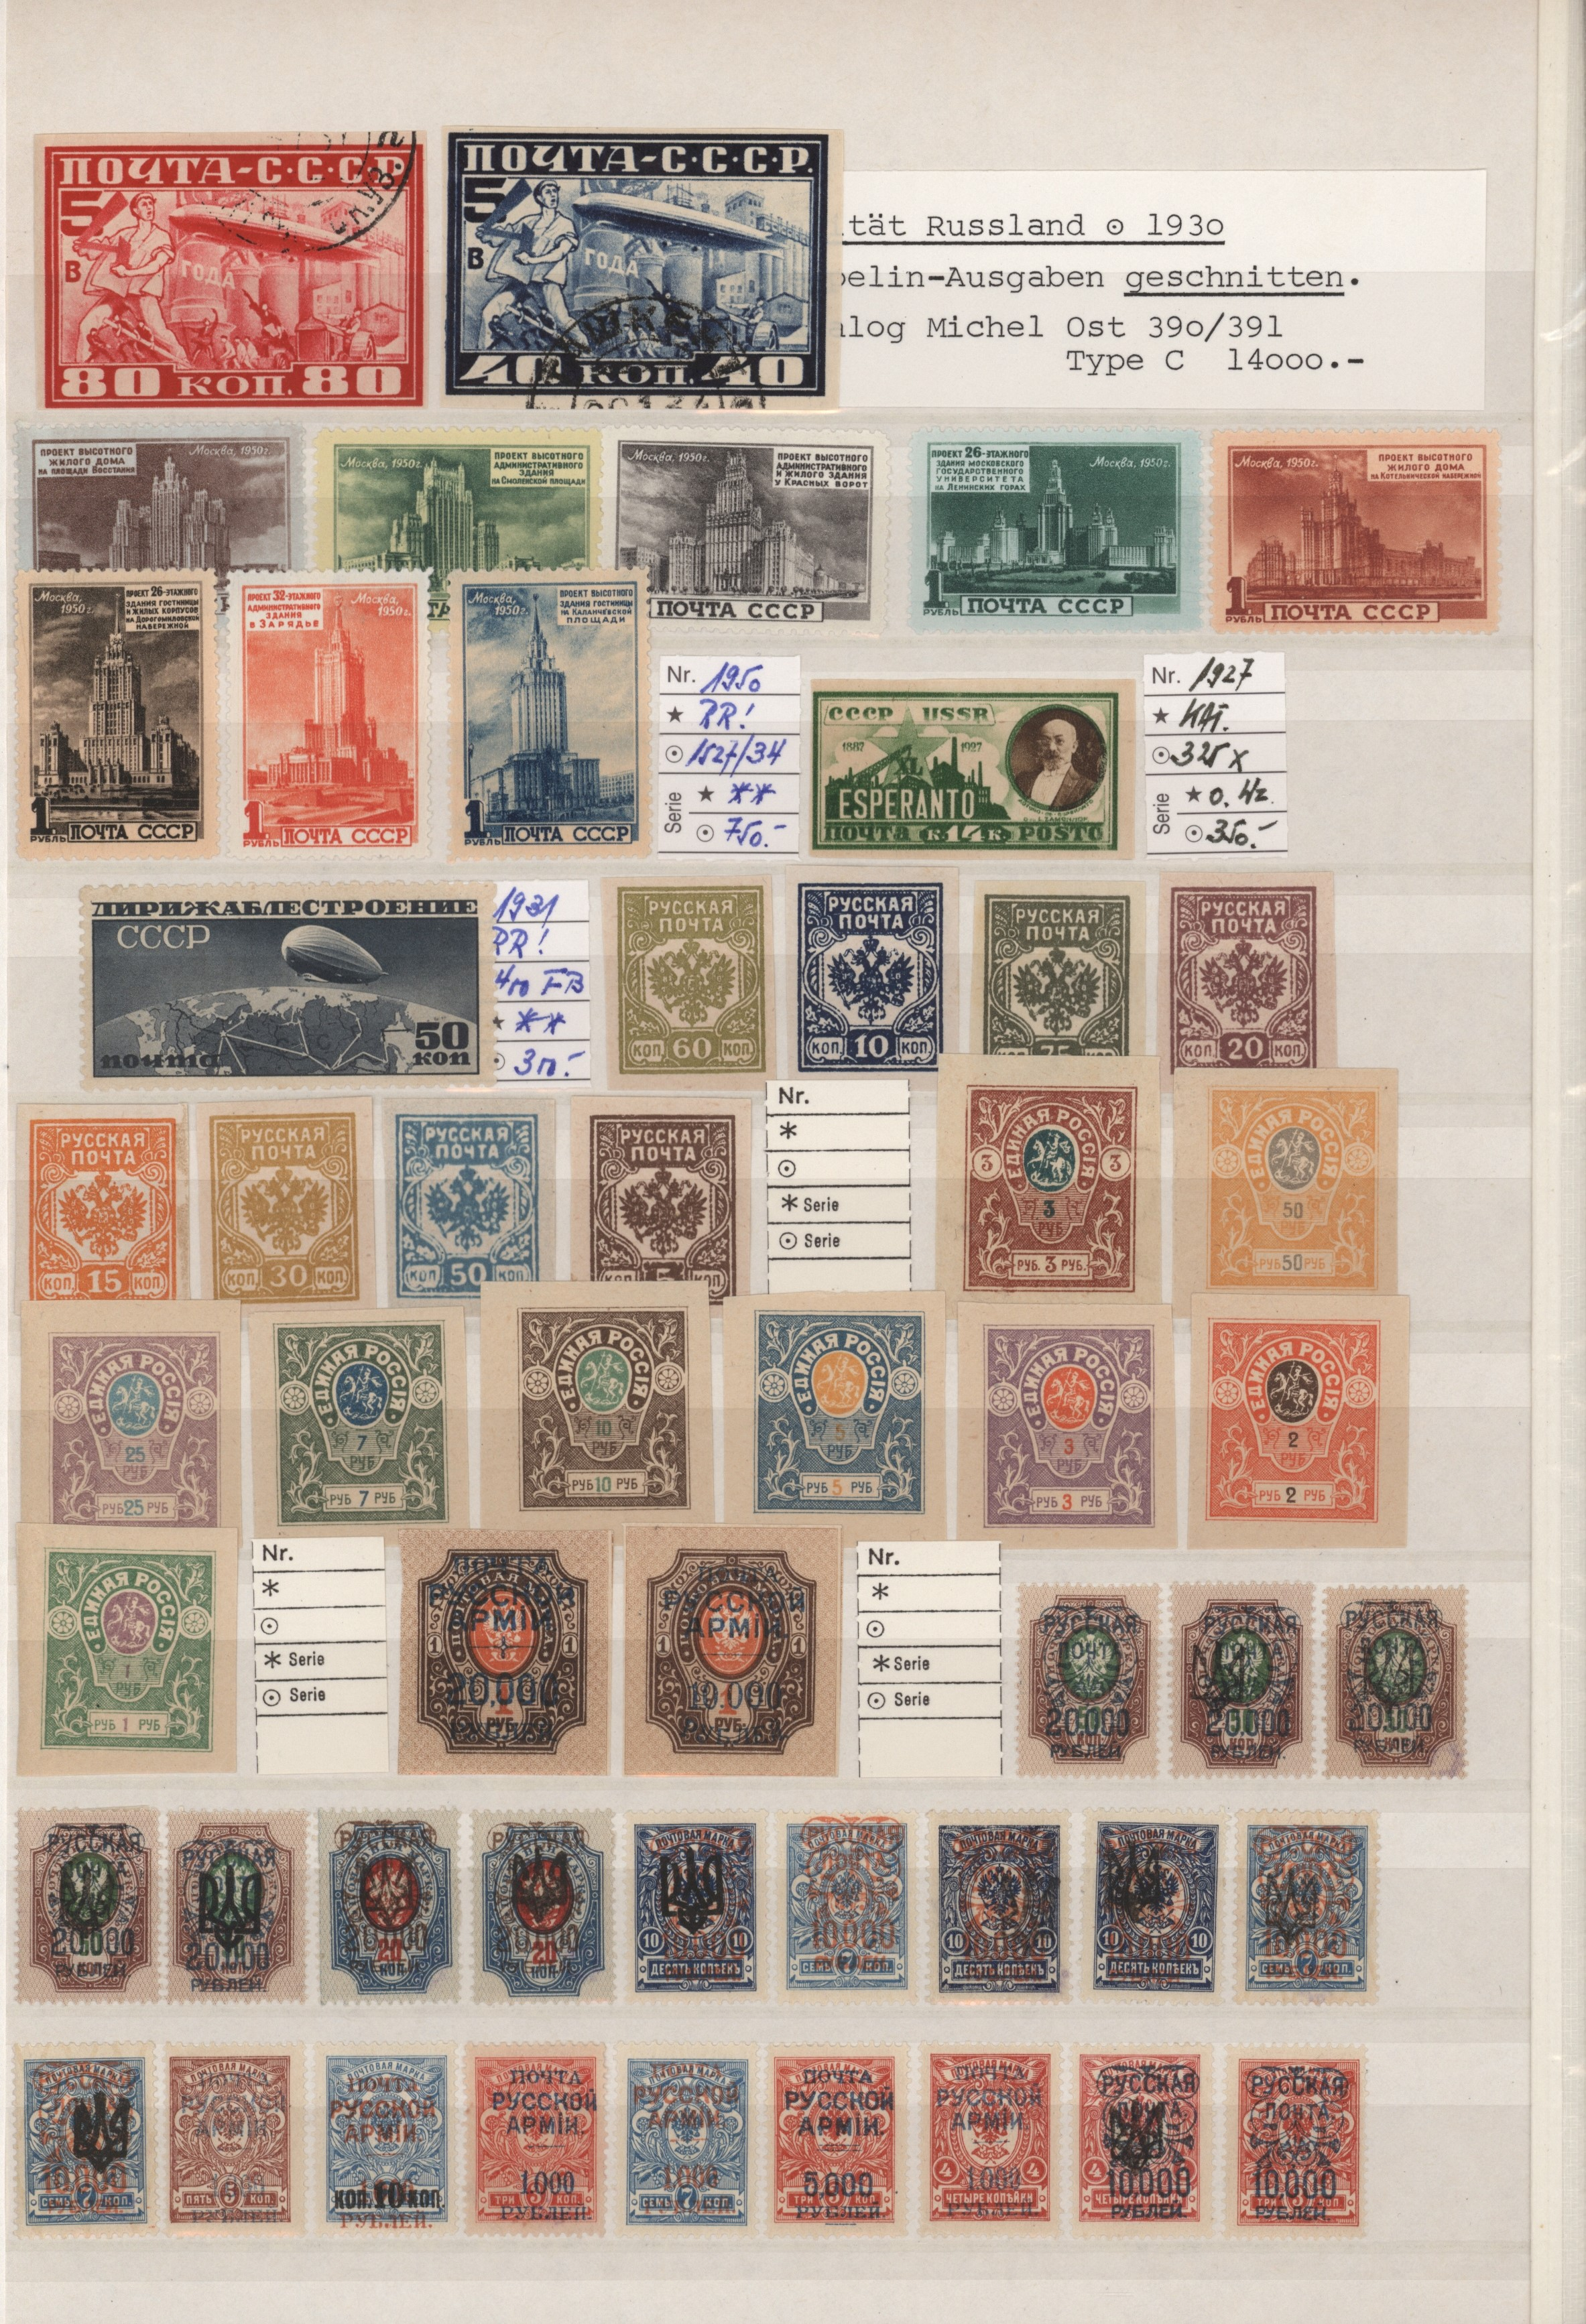 Lot 22416 - nachlässe  -  Auktionshaus Christoph Gärtner GmbH & Co. KG Sale #49 Collections Overseas, Thematics, Europe, Germany/Estates